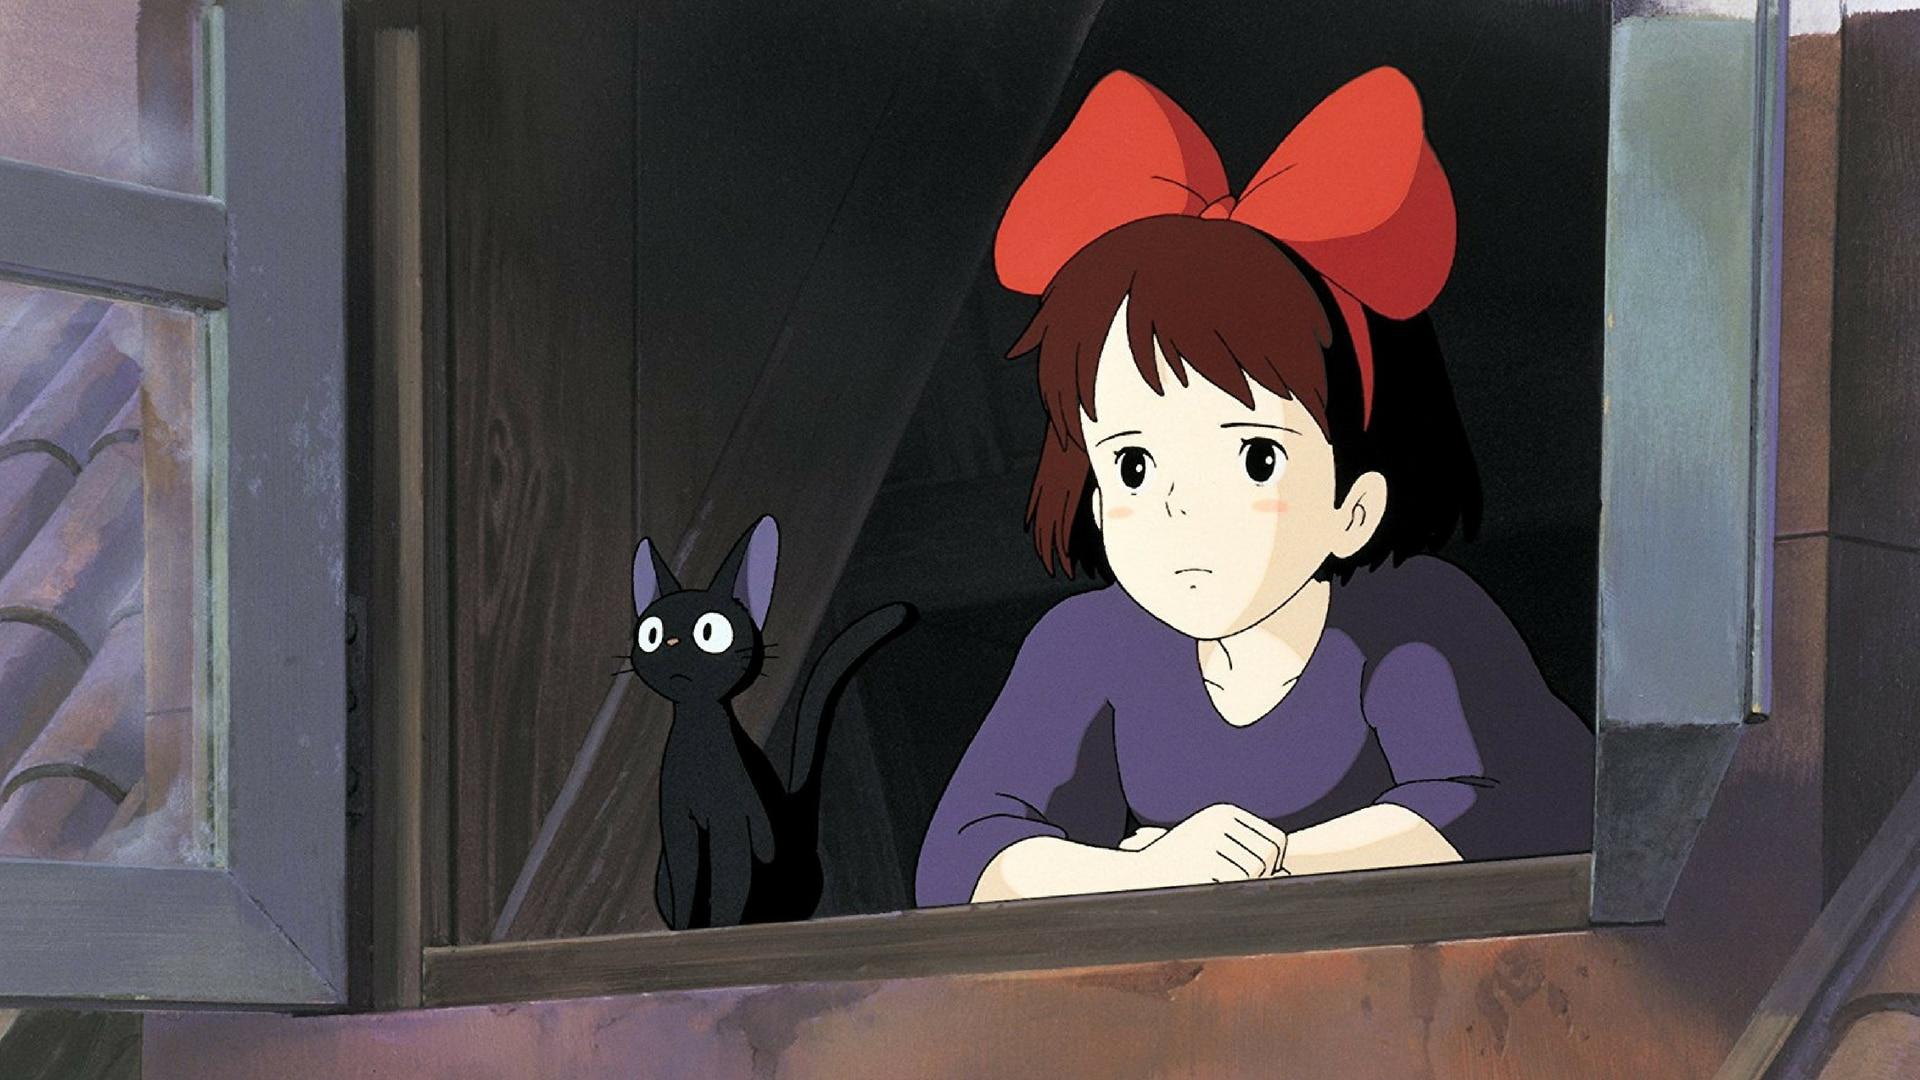 Film4 - Articles - Studio Ghibli: The Complete Adventure